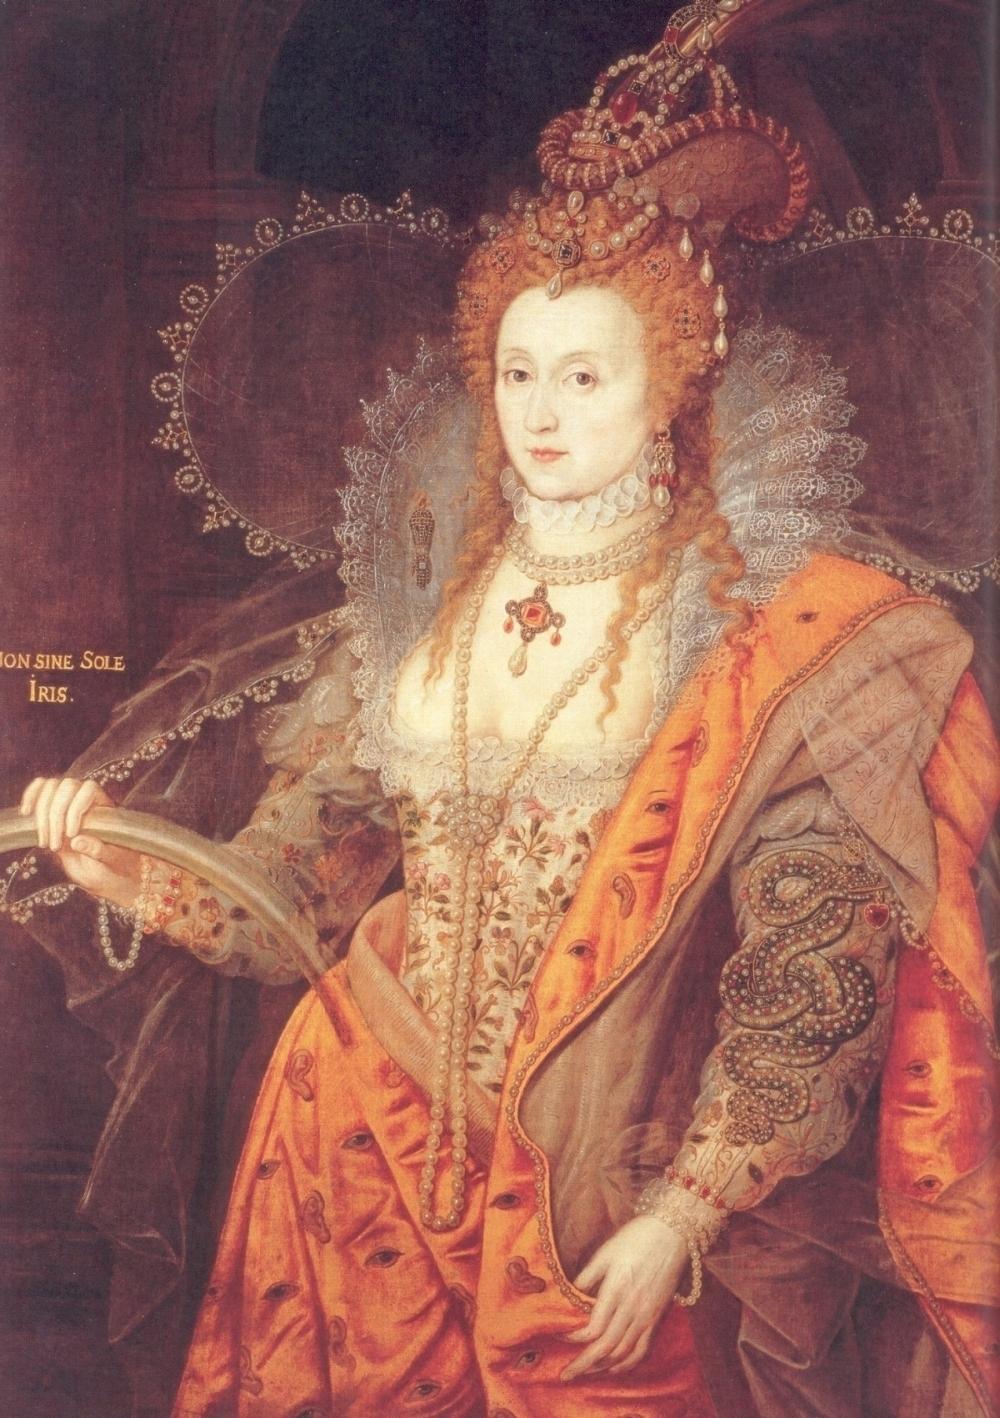 King henry viii queen elizabeth i daughter of henry viii